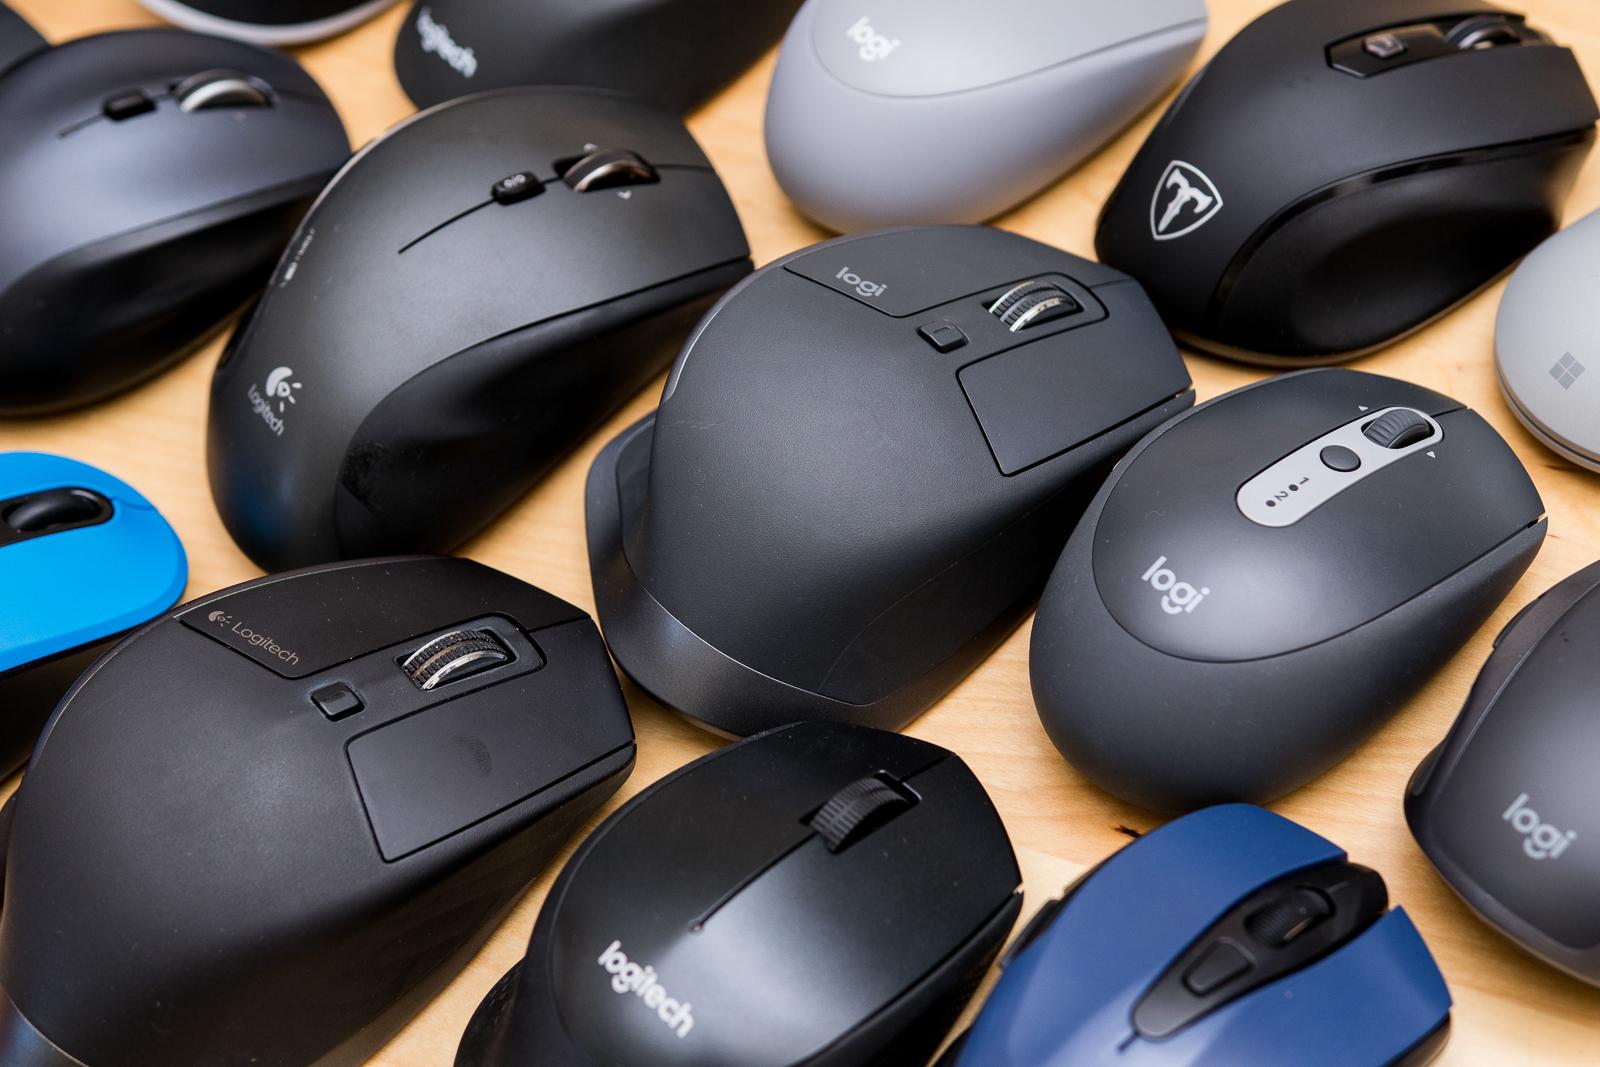 01-wireless-mouse-1600.jpg